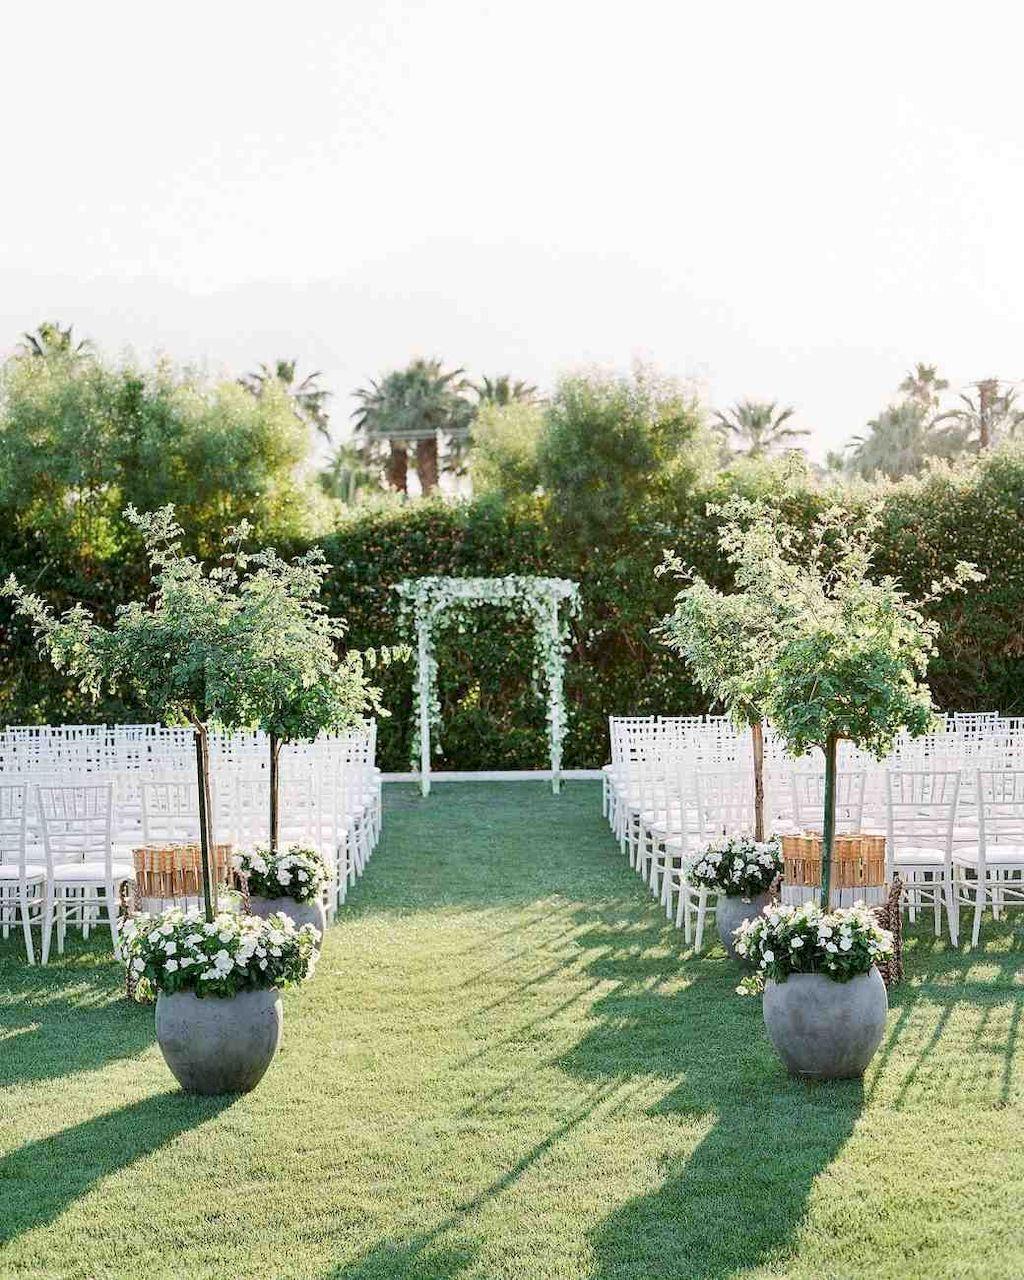 92 Unique and Greenary Wedding Backdrop Ideas | Backdrops and Weddings